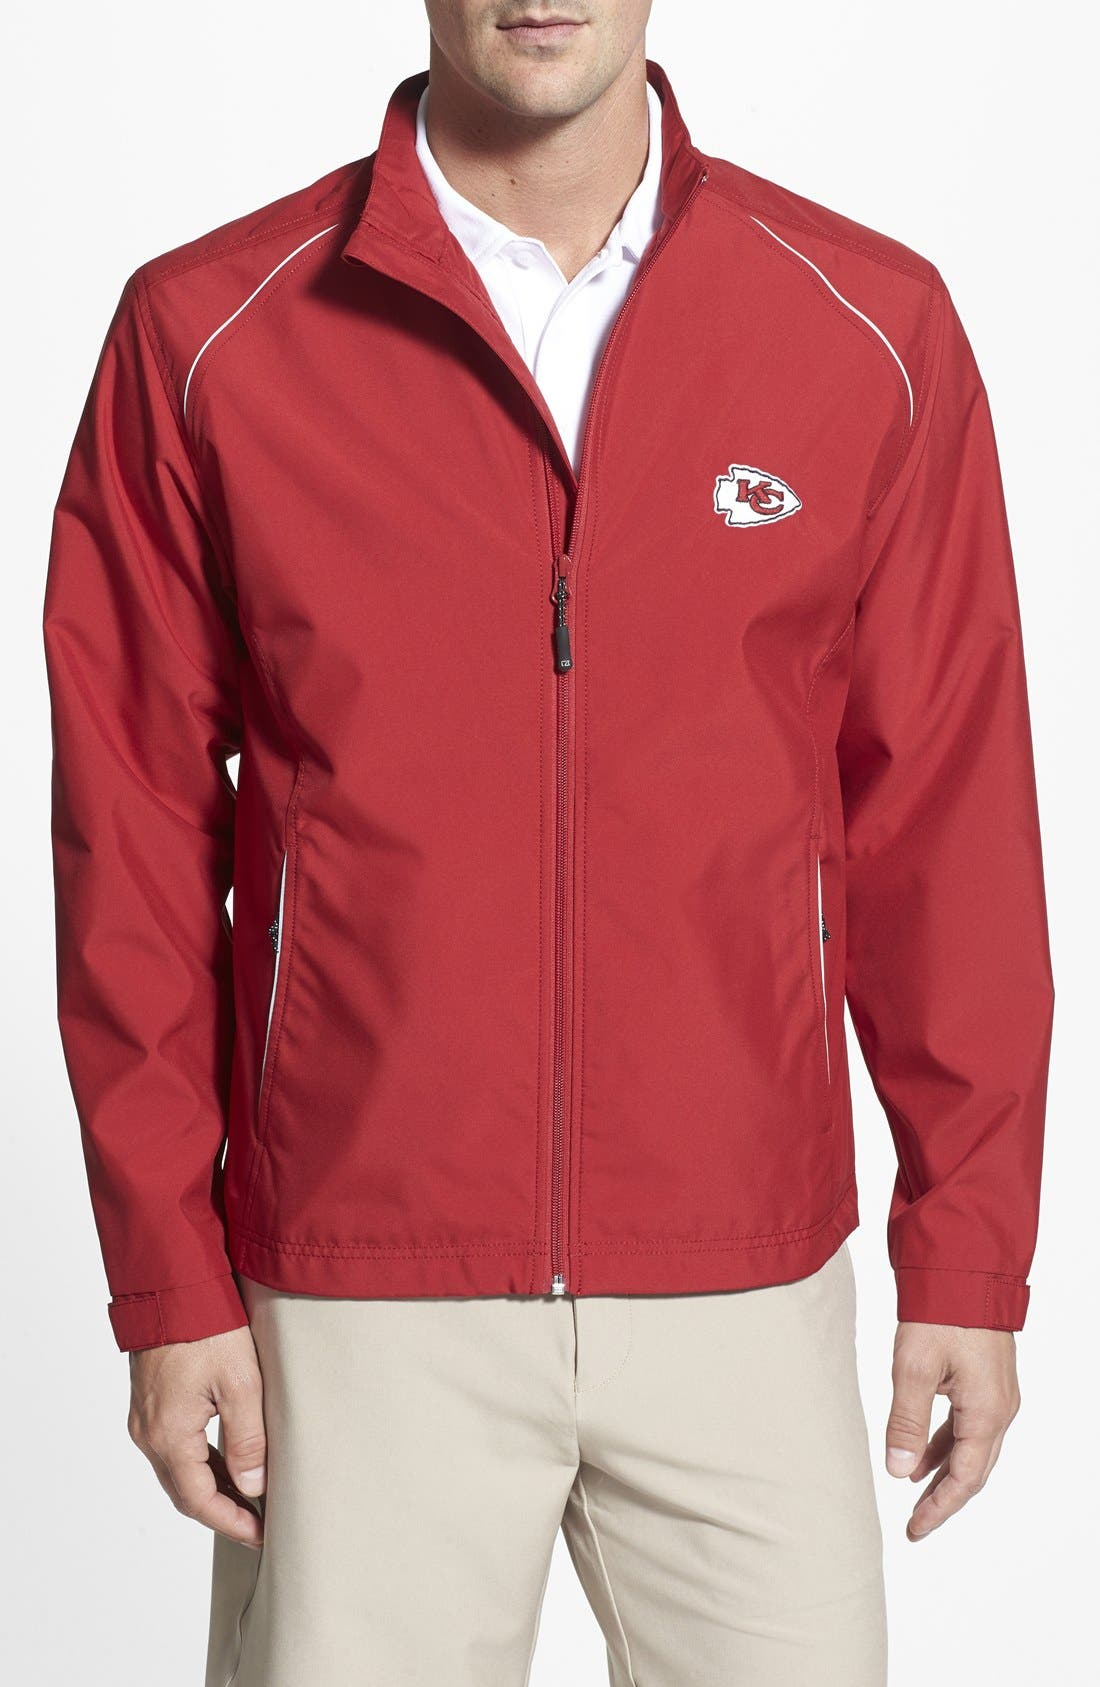 Main Image - Cutter & Buck Kansas City Chiefs - Beacon WeatherTec Wind & Water Resistant Jacket